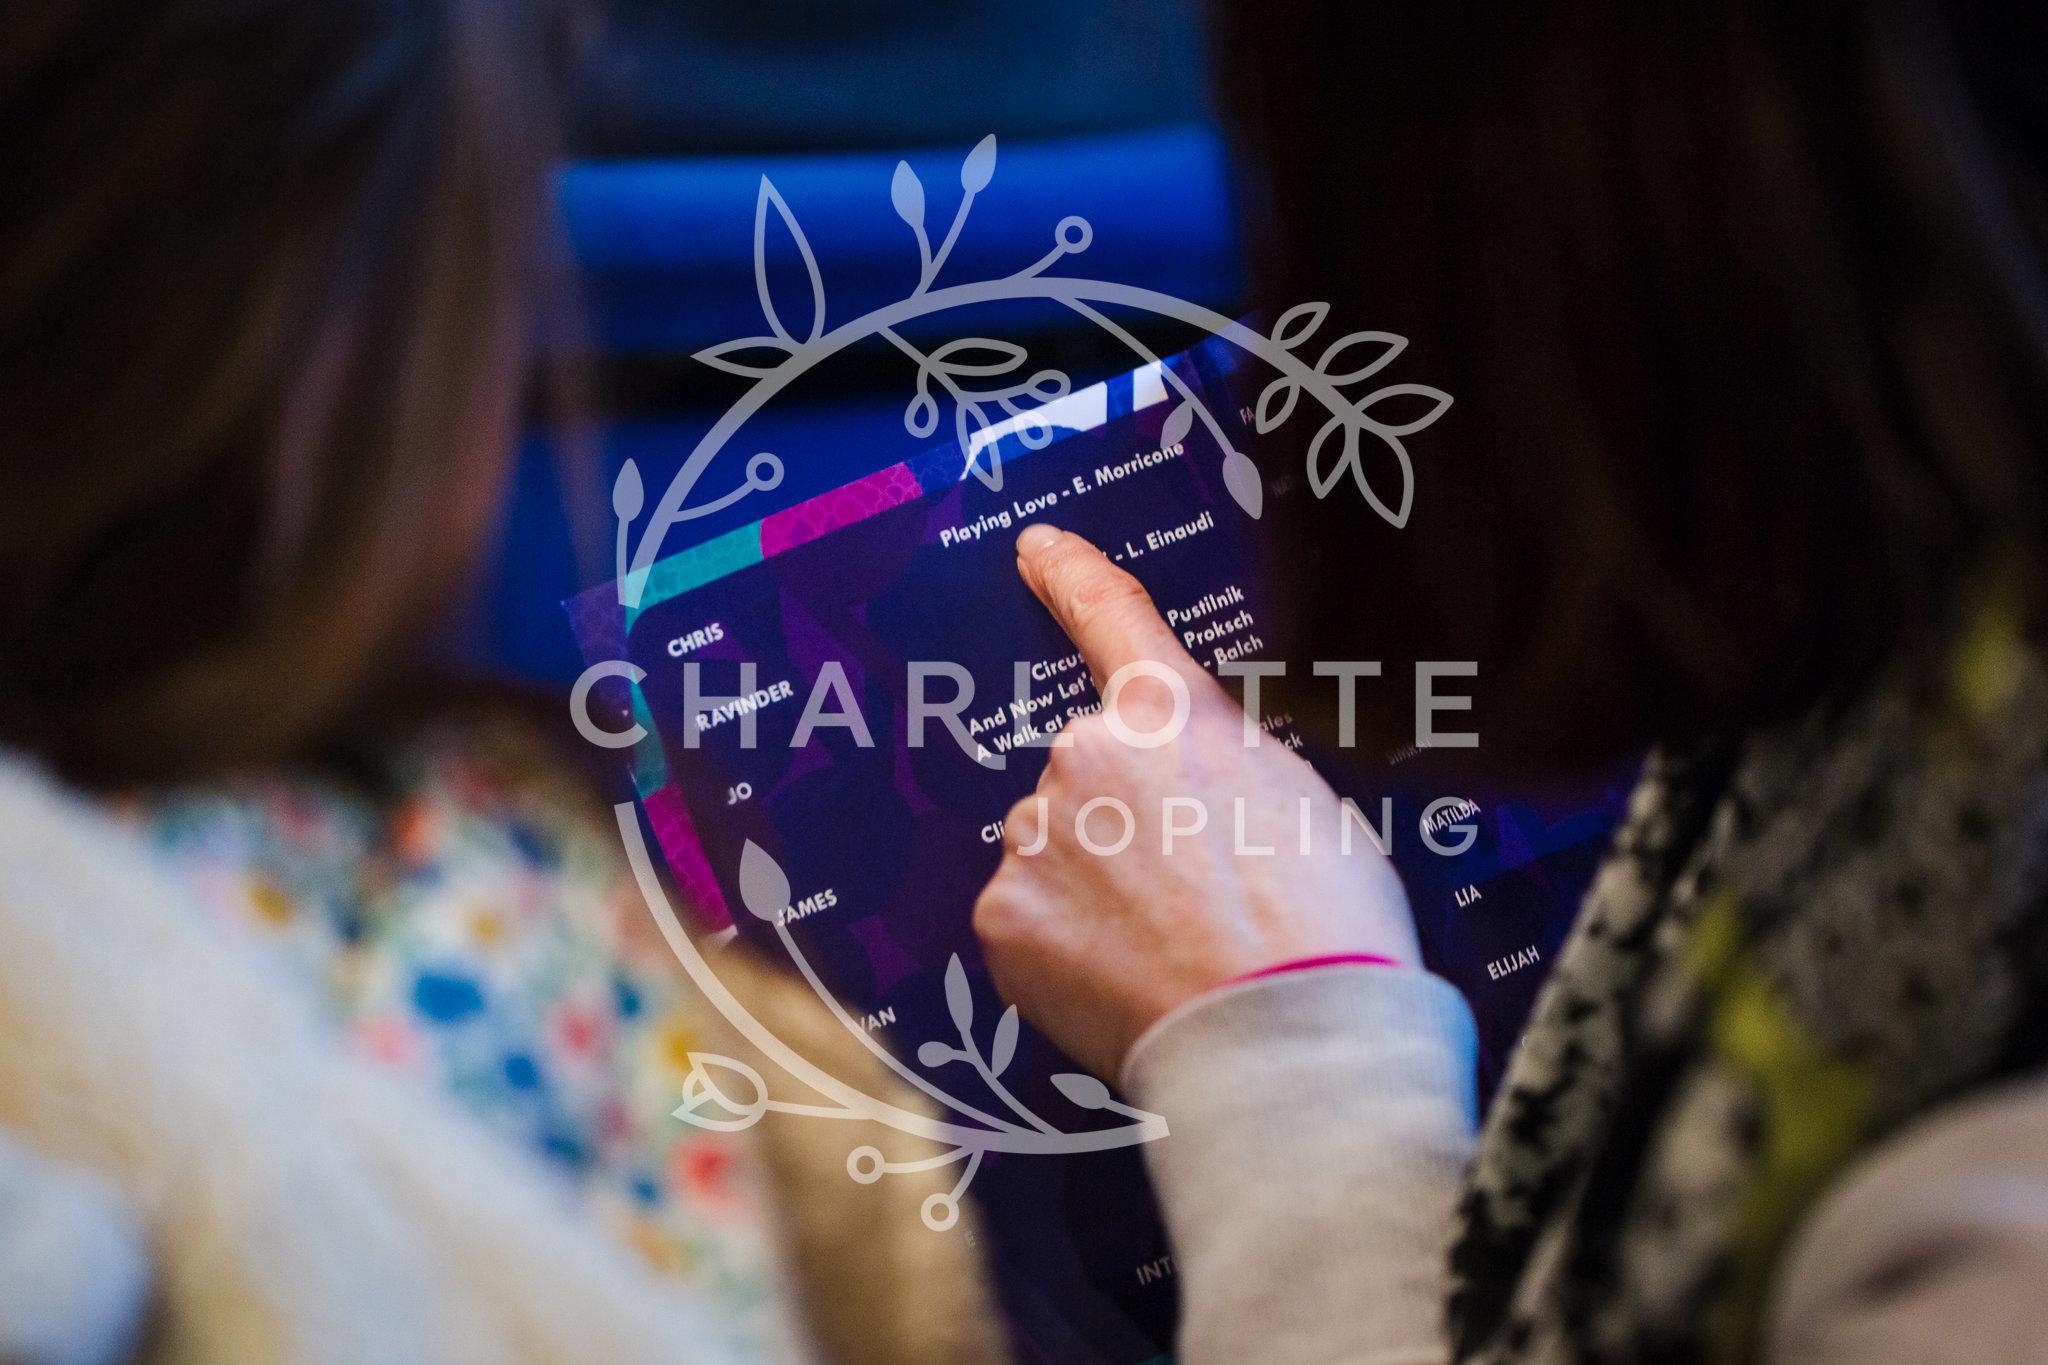 Stepping-Stones-Voicebox-Concert-2018-by-Charlotte-Jopling-3.jpg